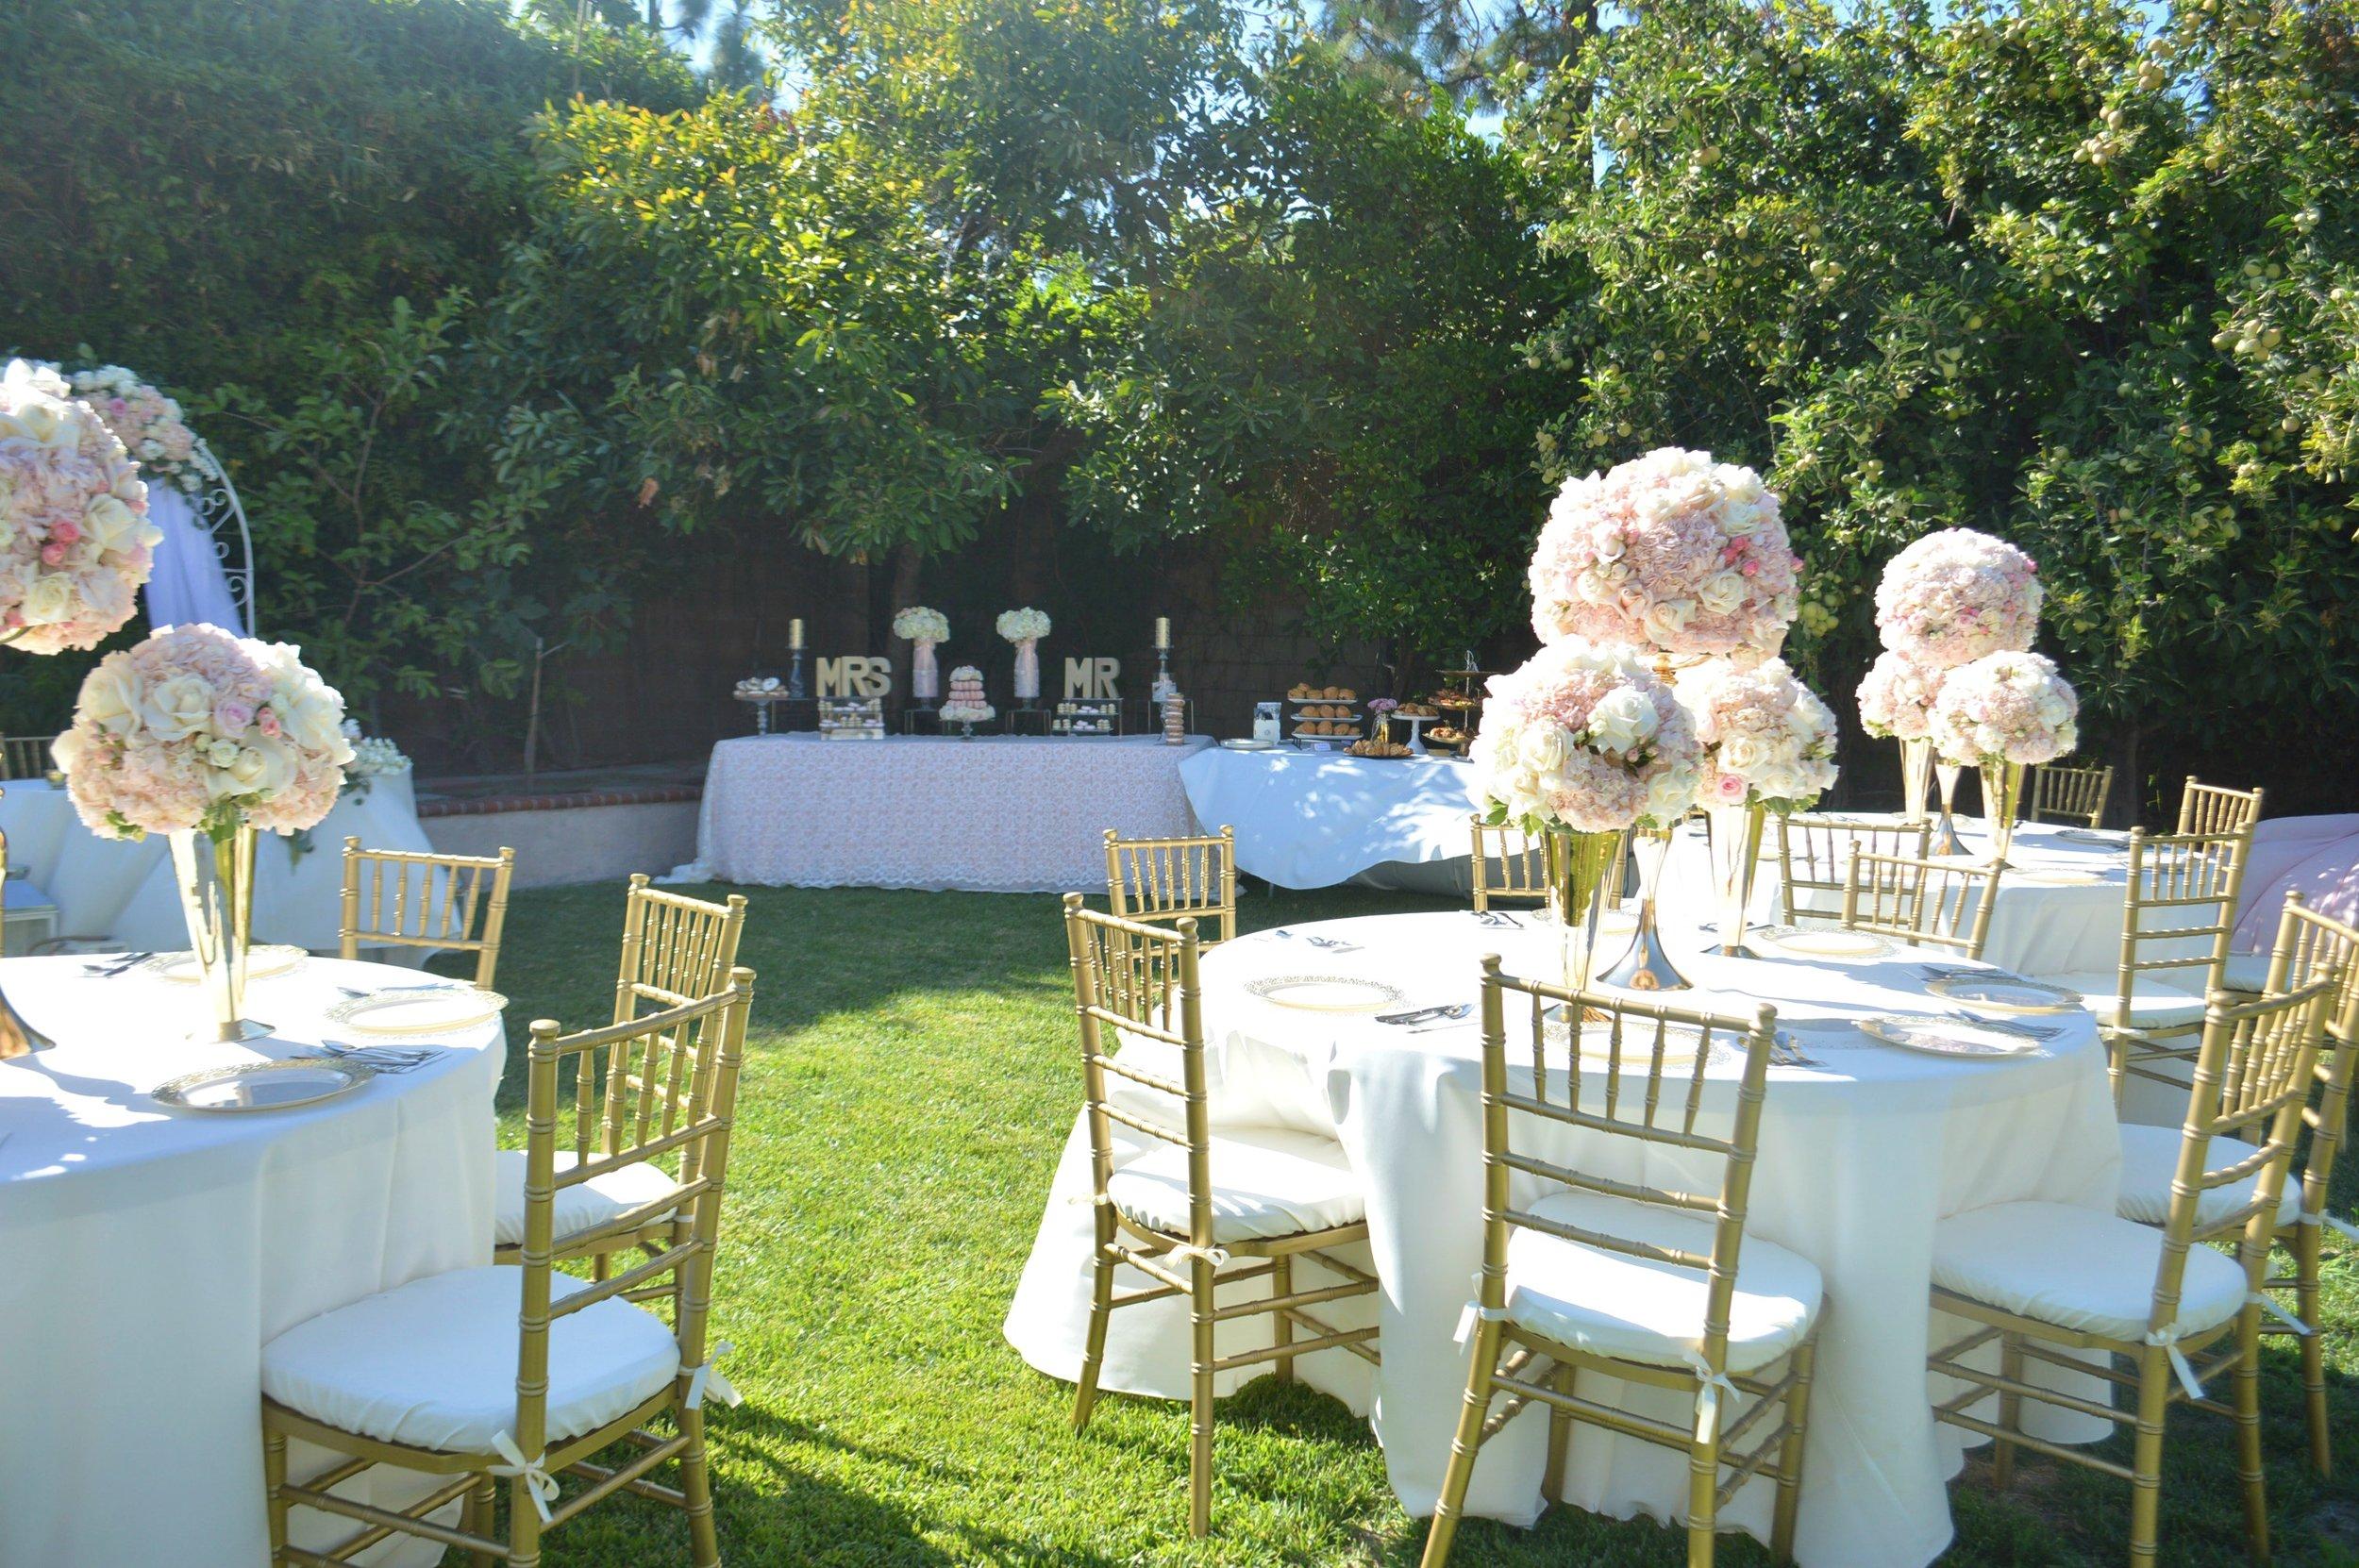 Garden Wedding-Summer Wedding-Wedding Ideas-Summer Wedding ideas-Backyard Wedding-Summer Wedding-www.SugarPartiesLA.com.jpg